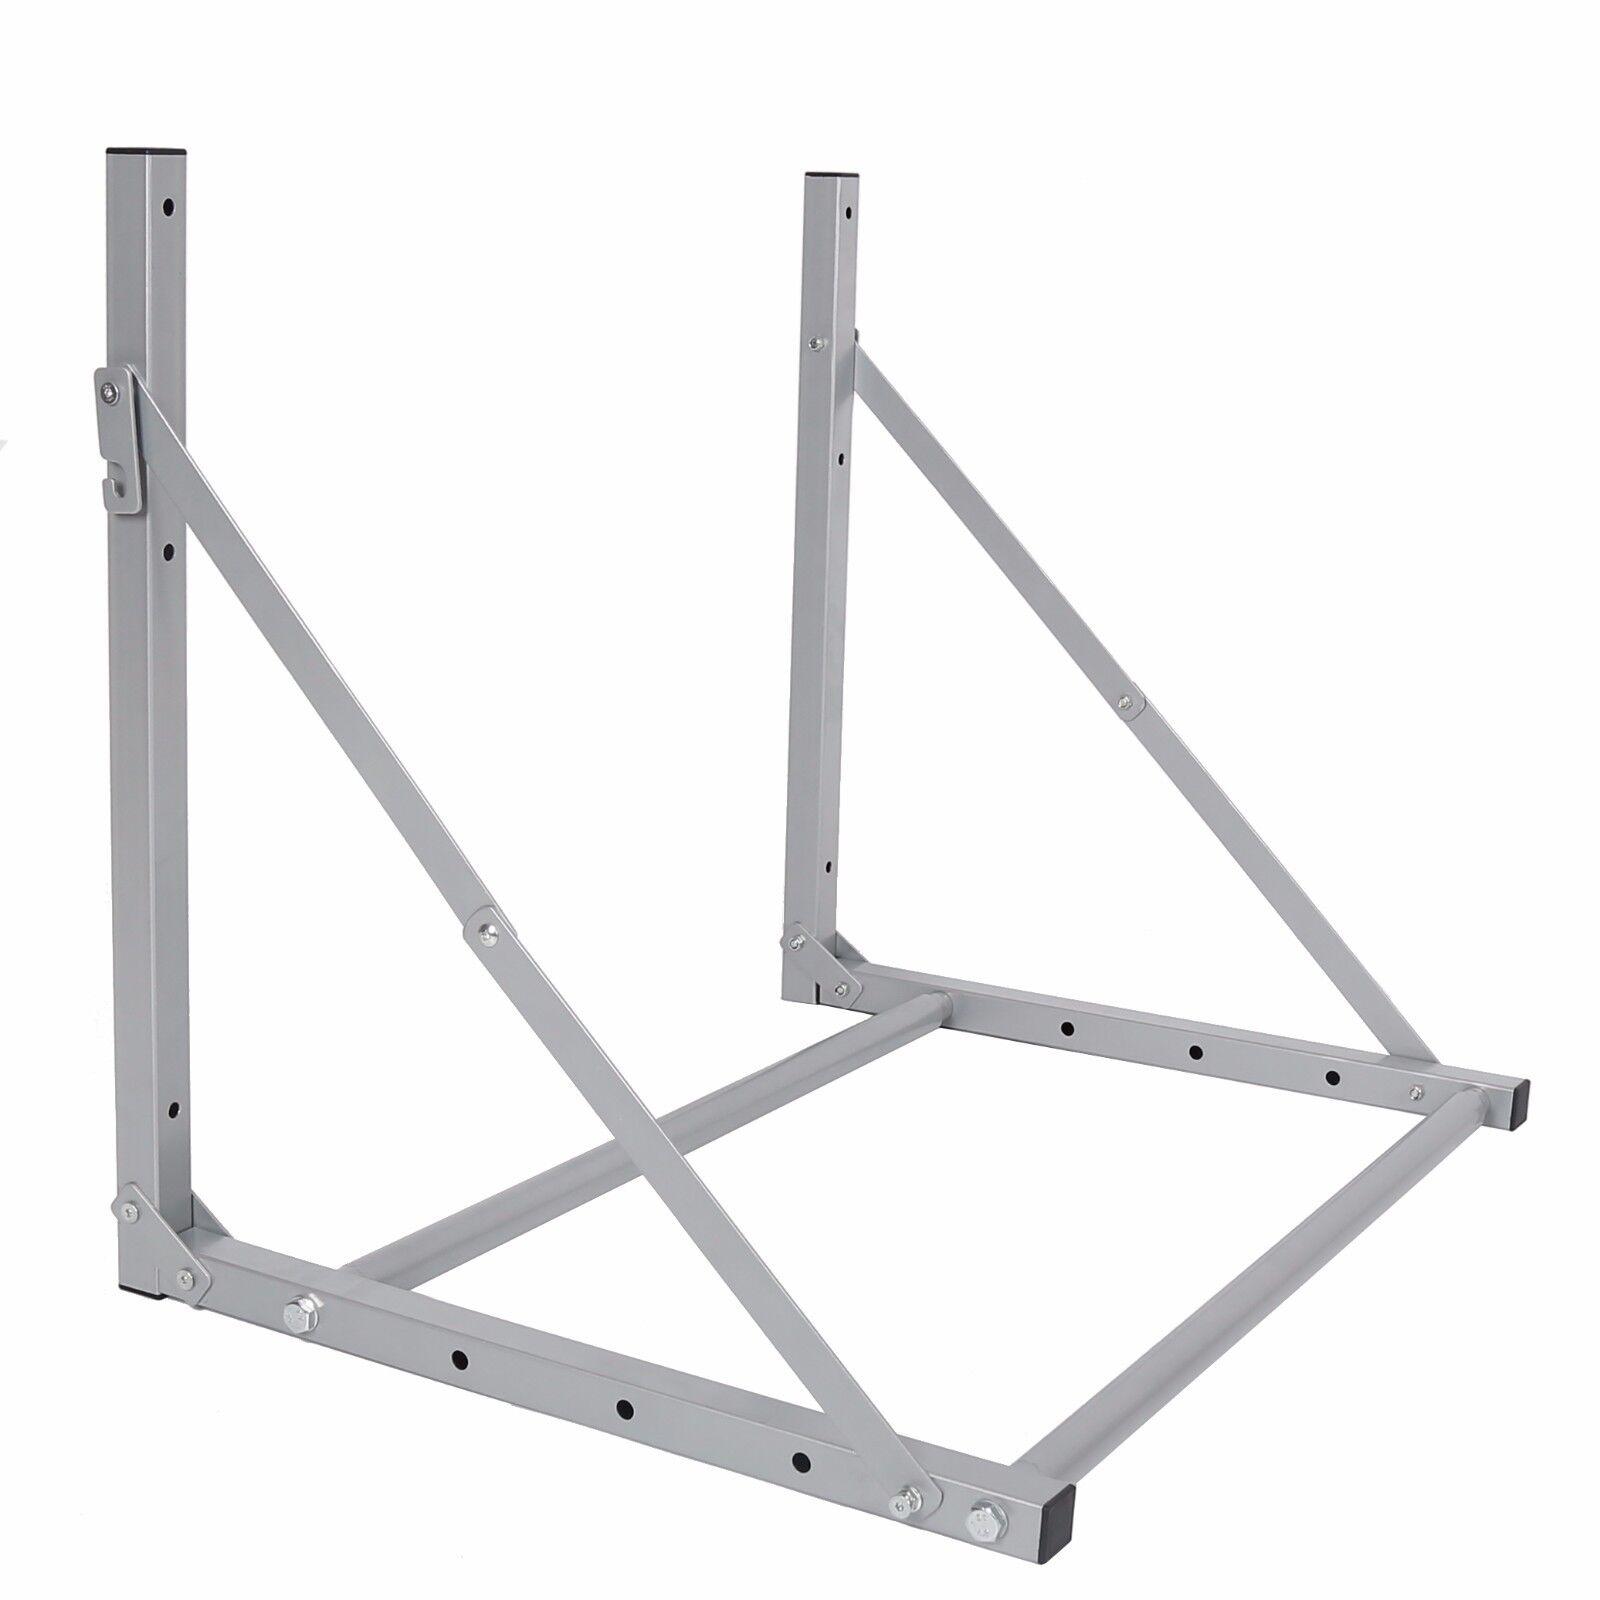 Folding 4 Tire Wheel Rack Storage Holder Heavy Duty Garage W